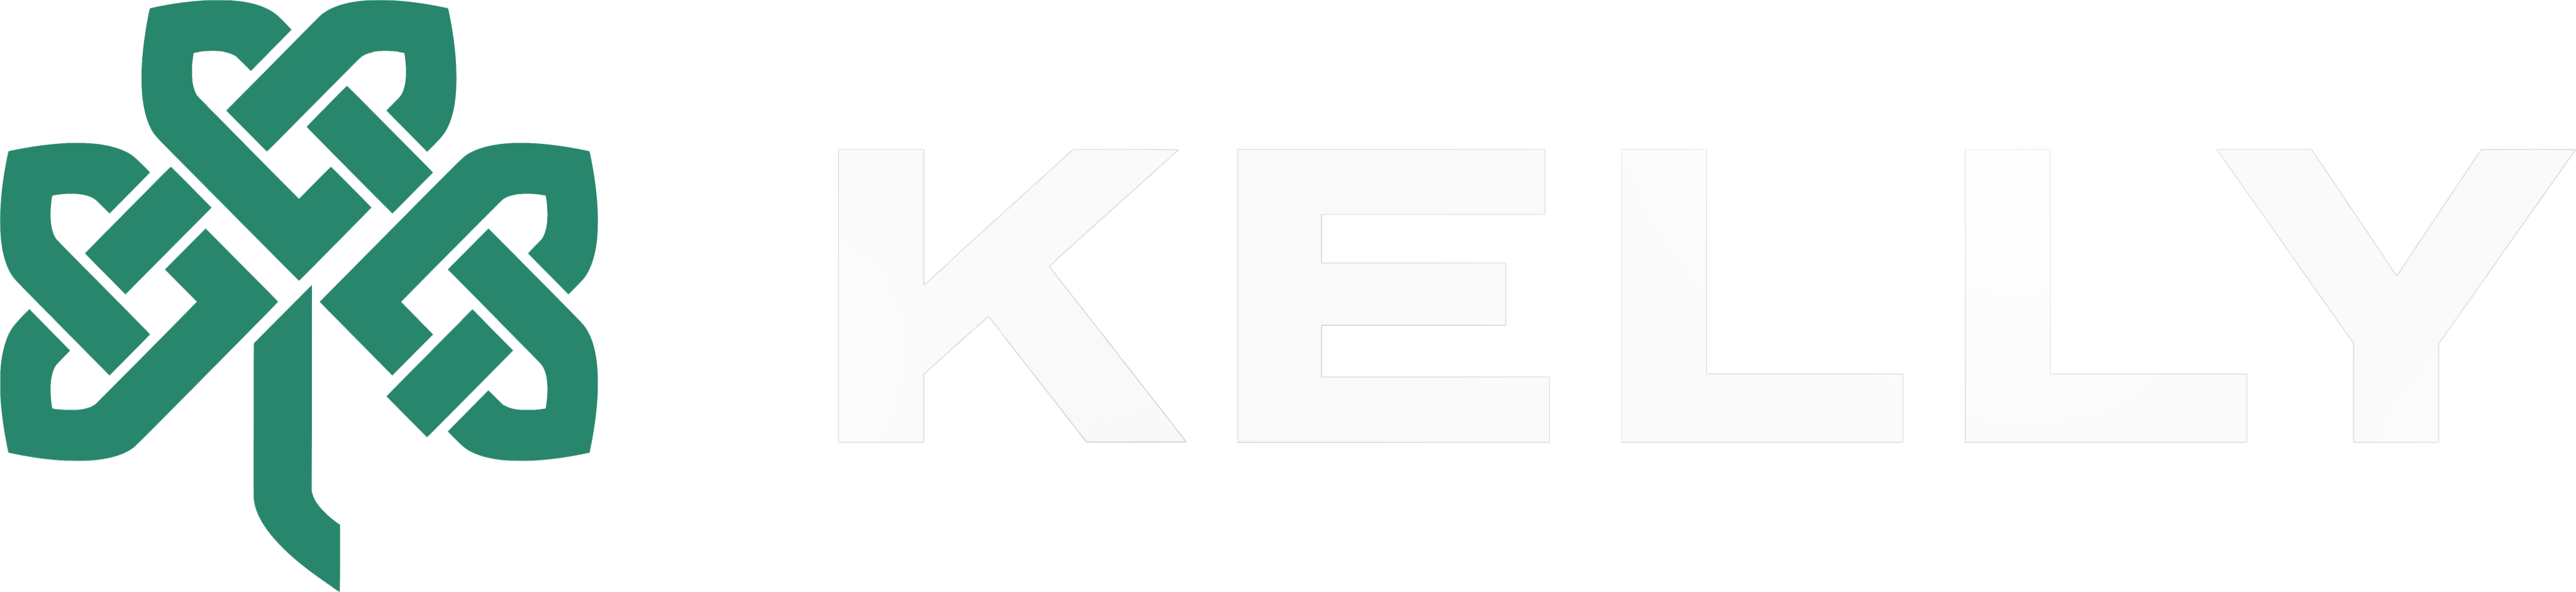 Kelly Financial Advisors, LLC